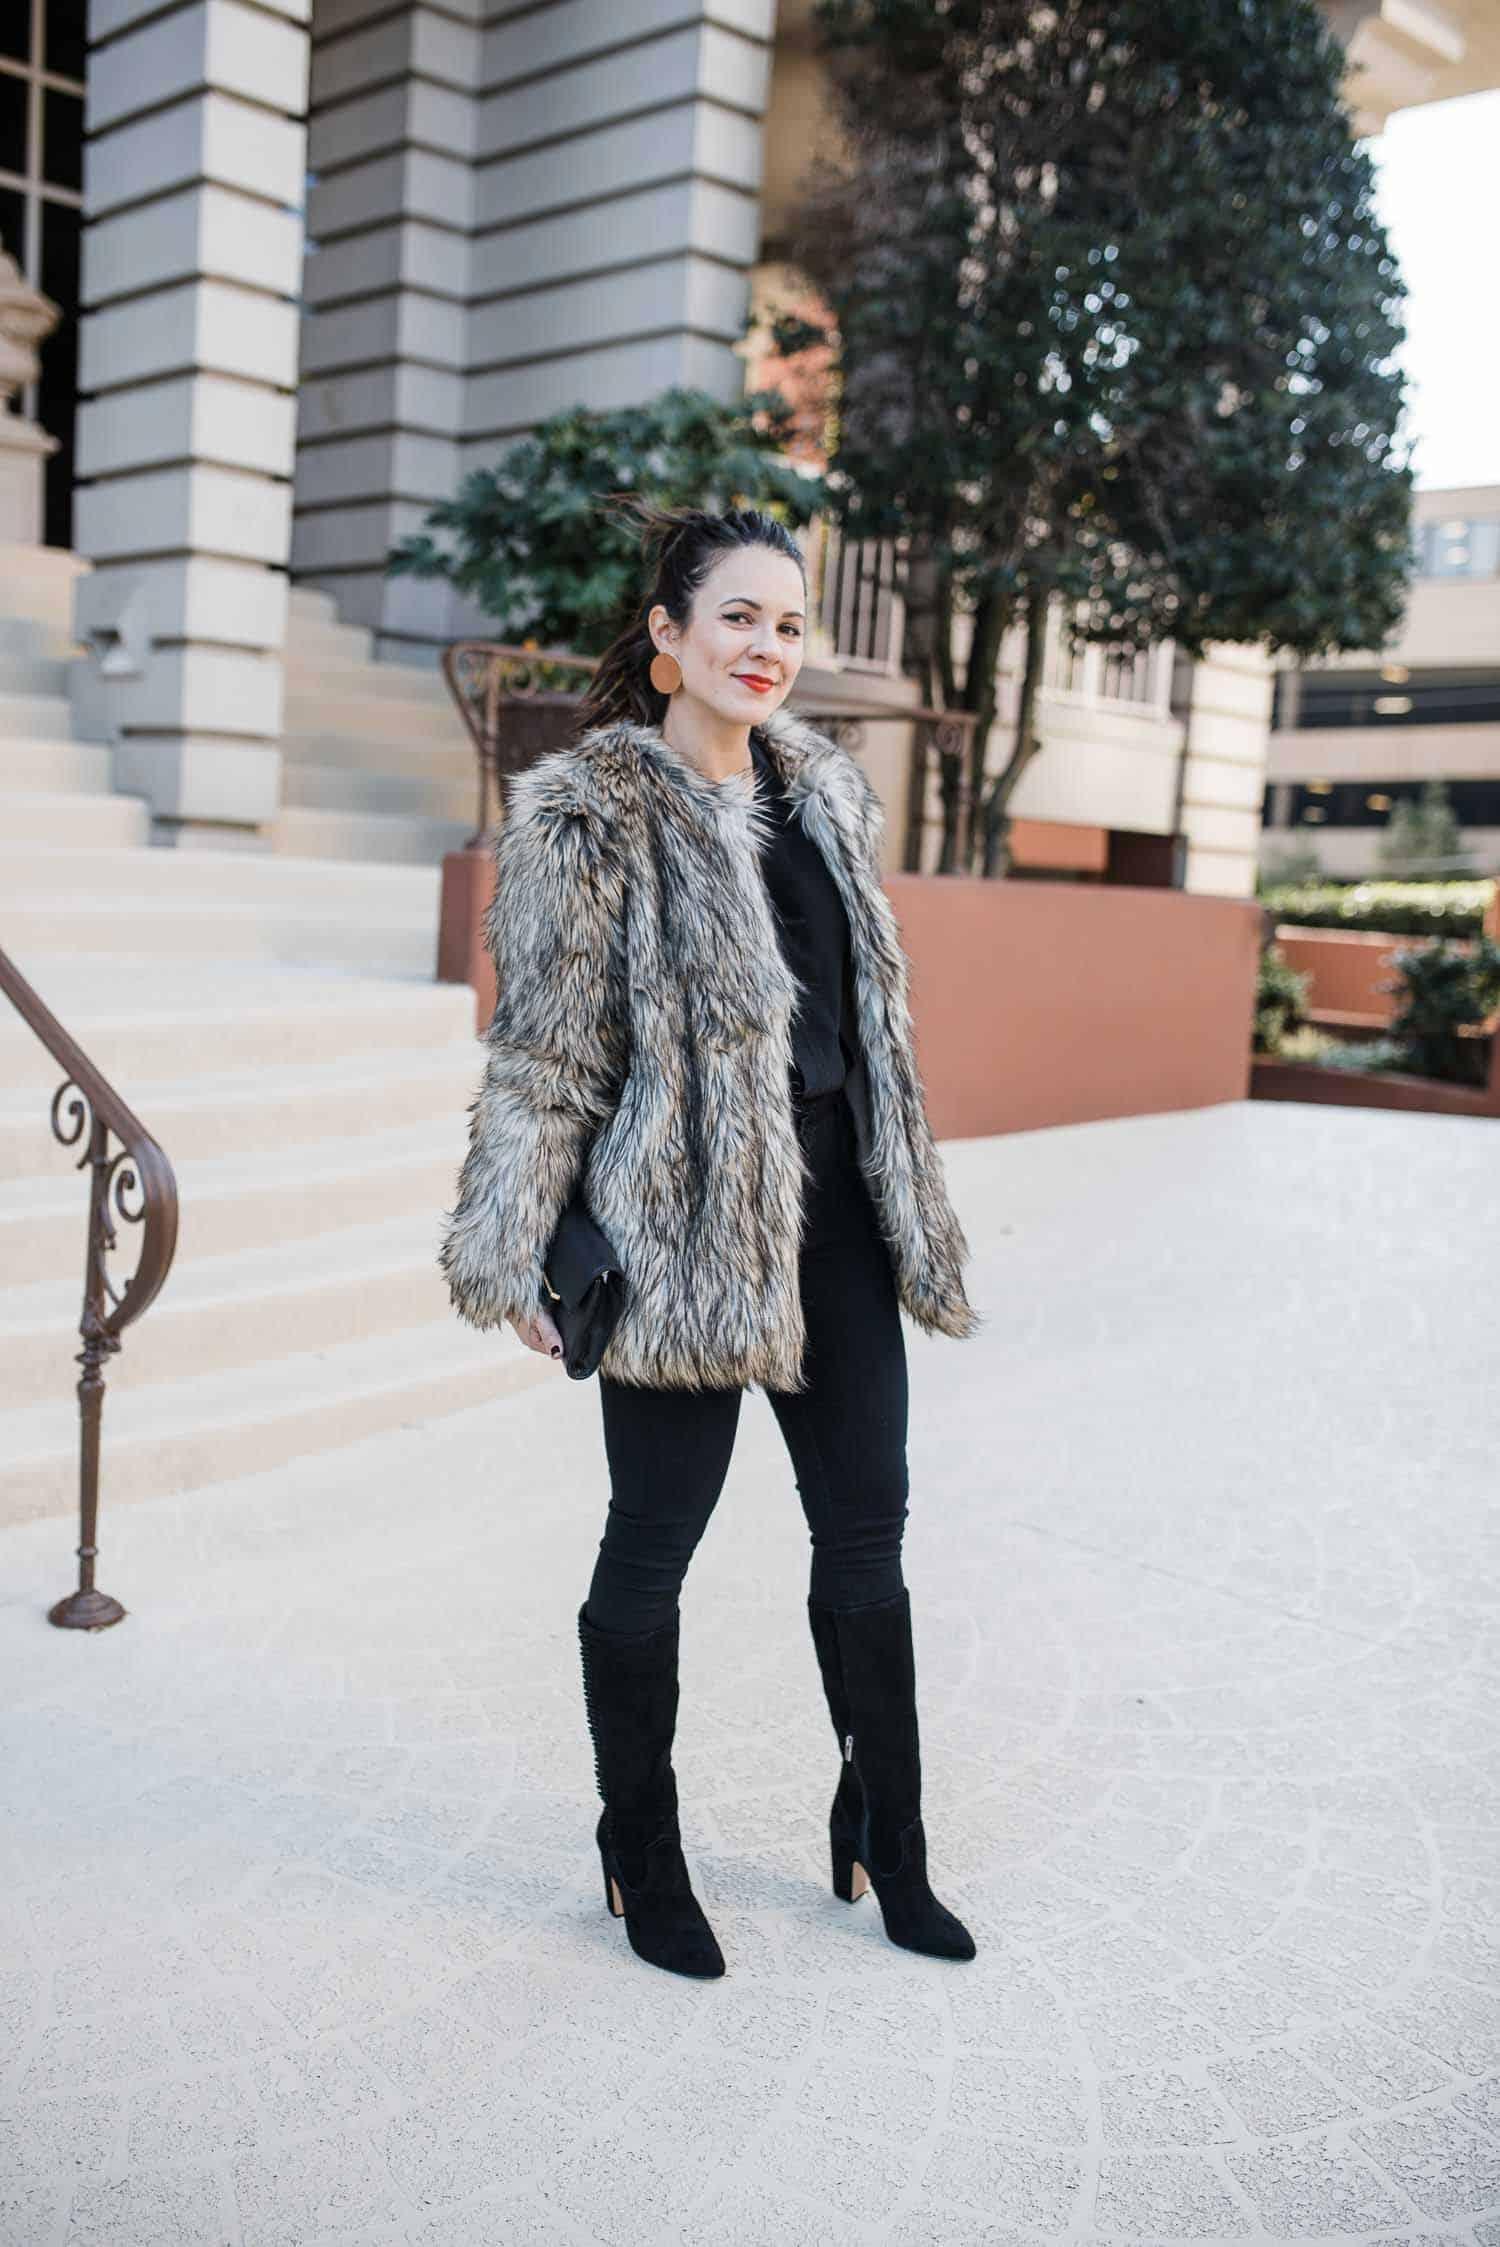 b7b88eeecc Vince Camuto faux fur jacket - My Style Vita ...